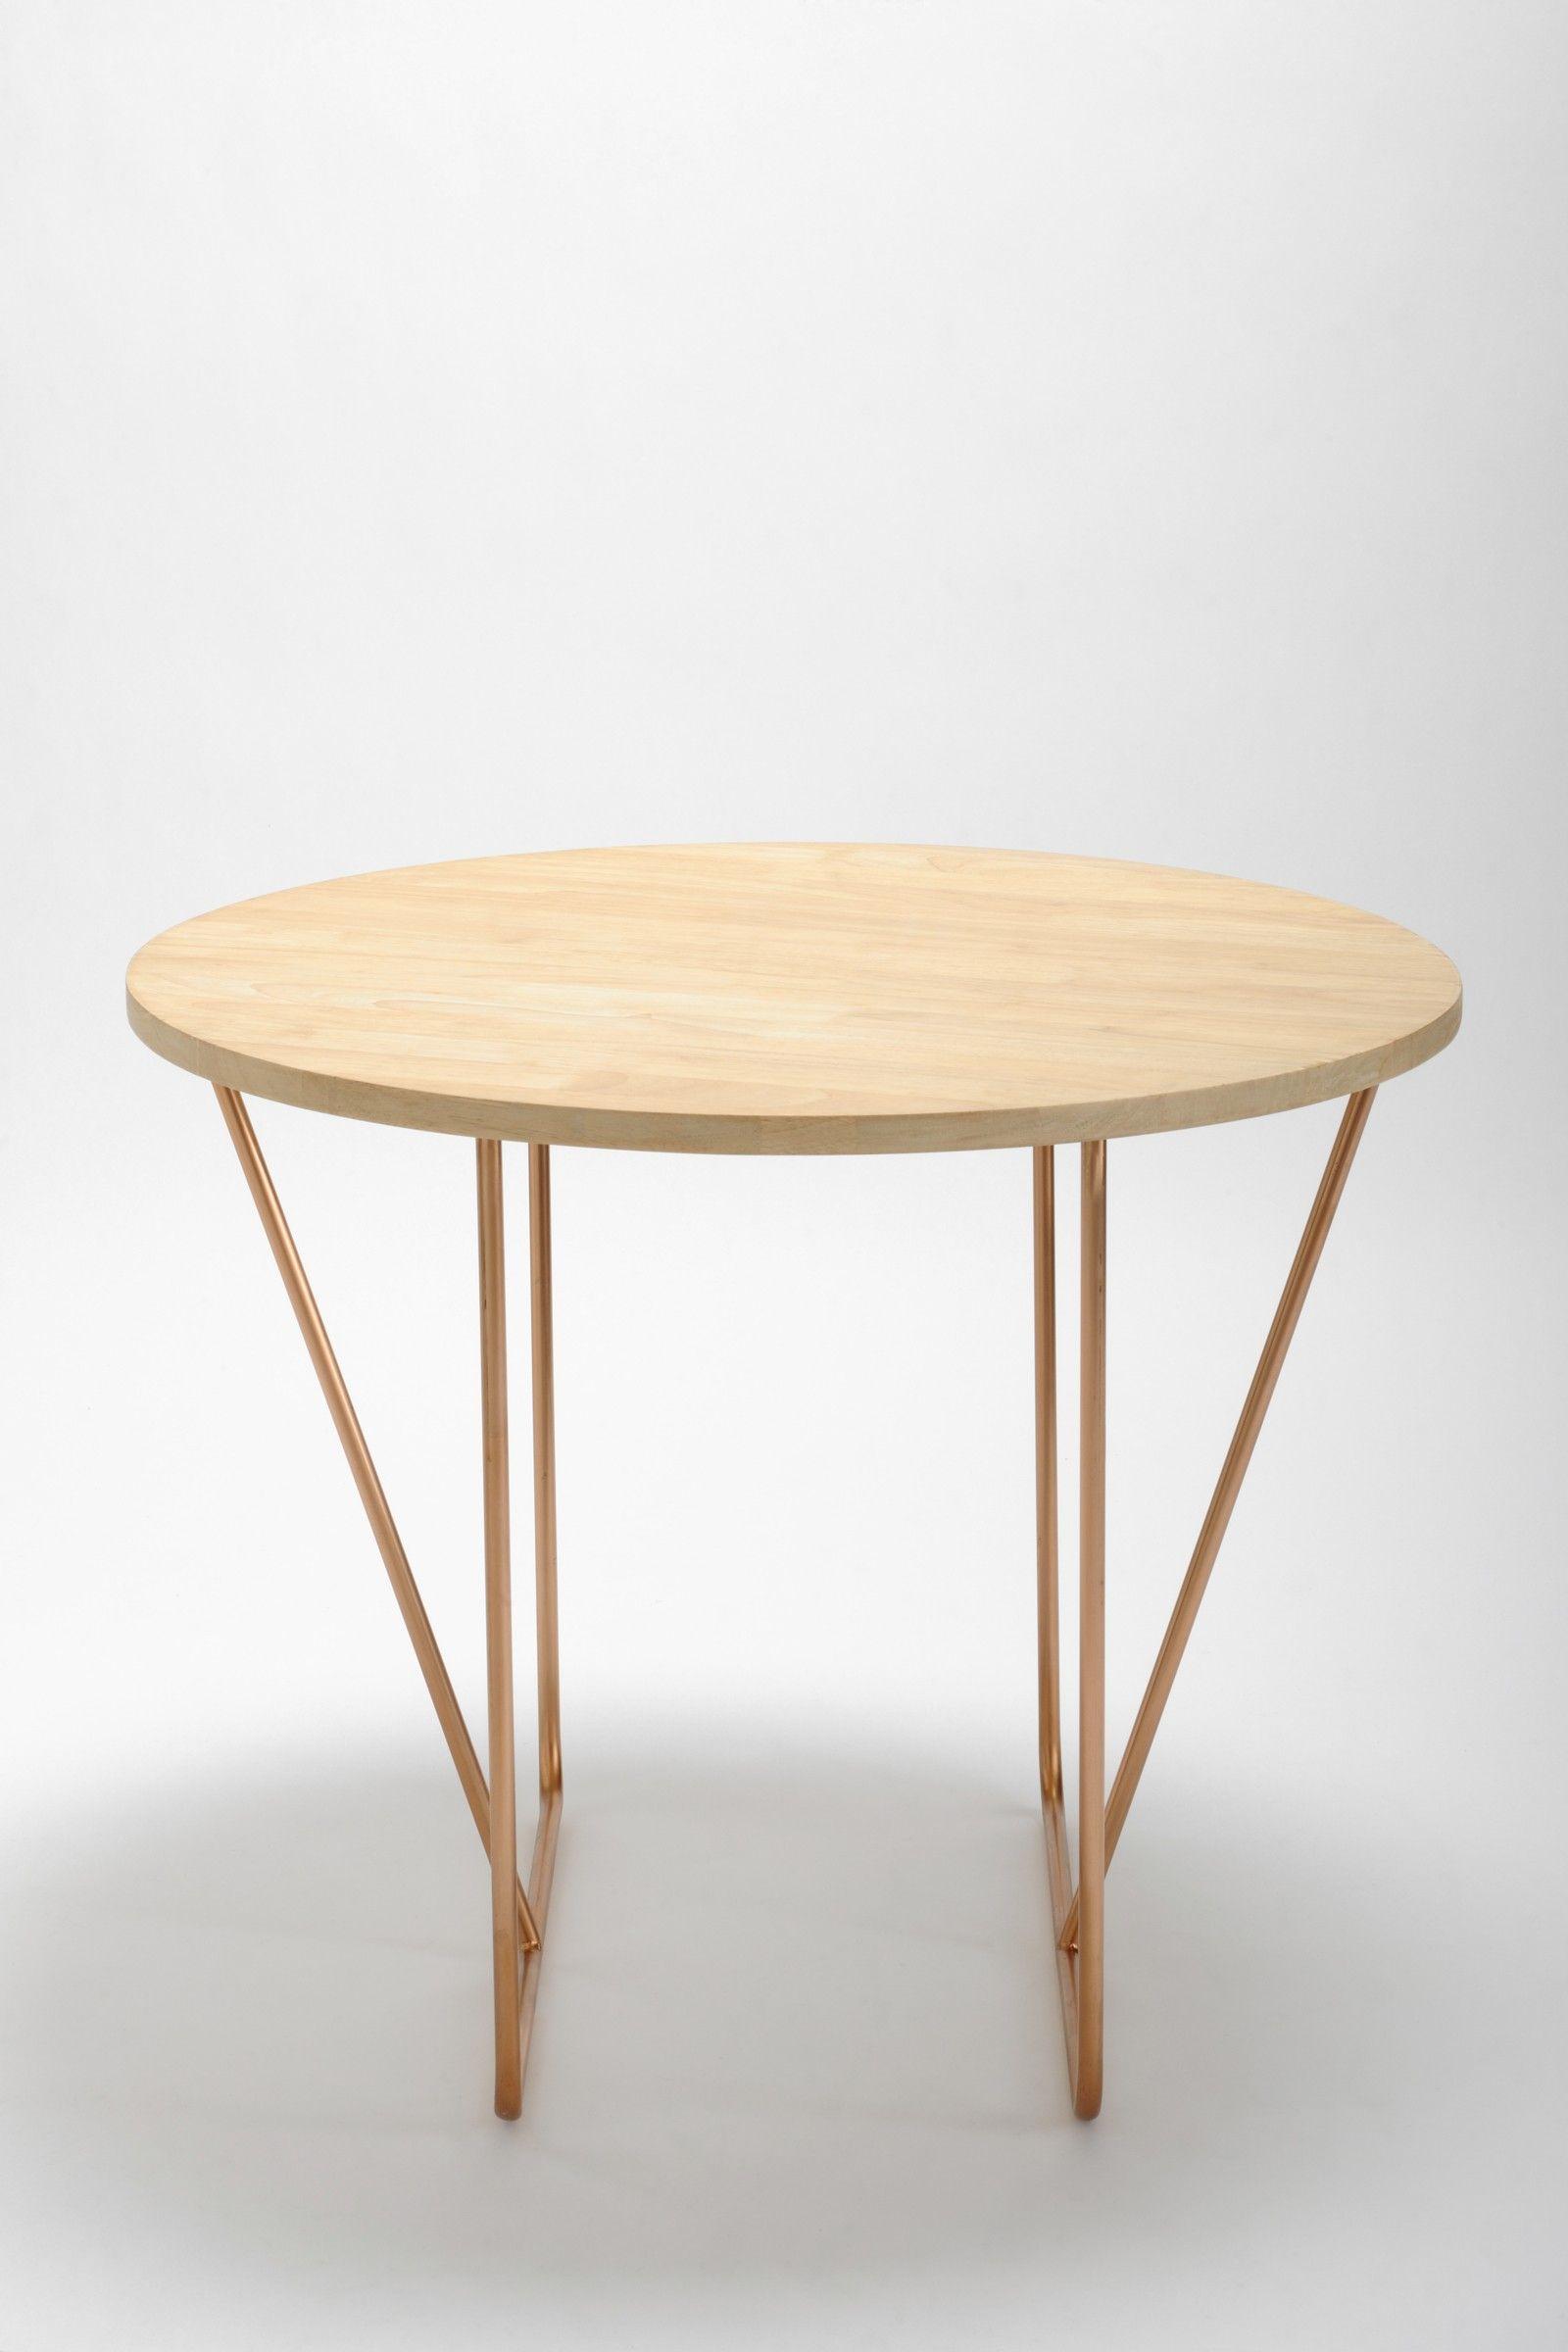 d26ad9641ddf03ae2f0d61f785356494 Unique De Table Basse Noyer Design Concept